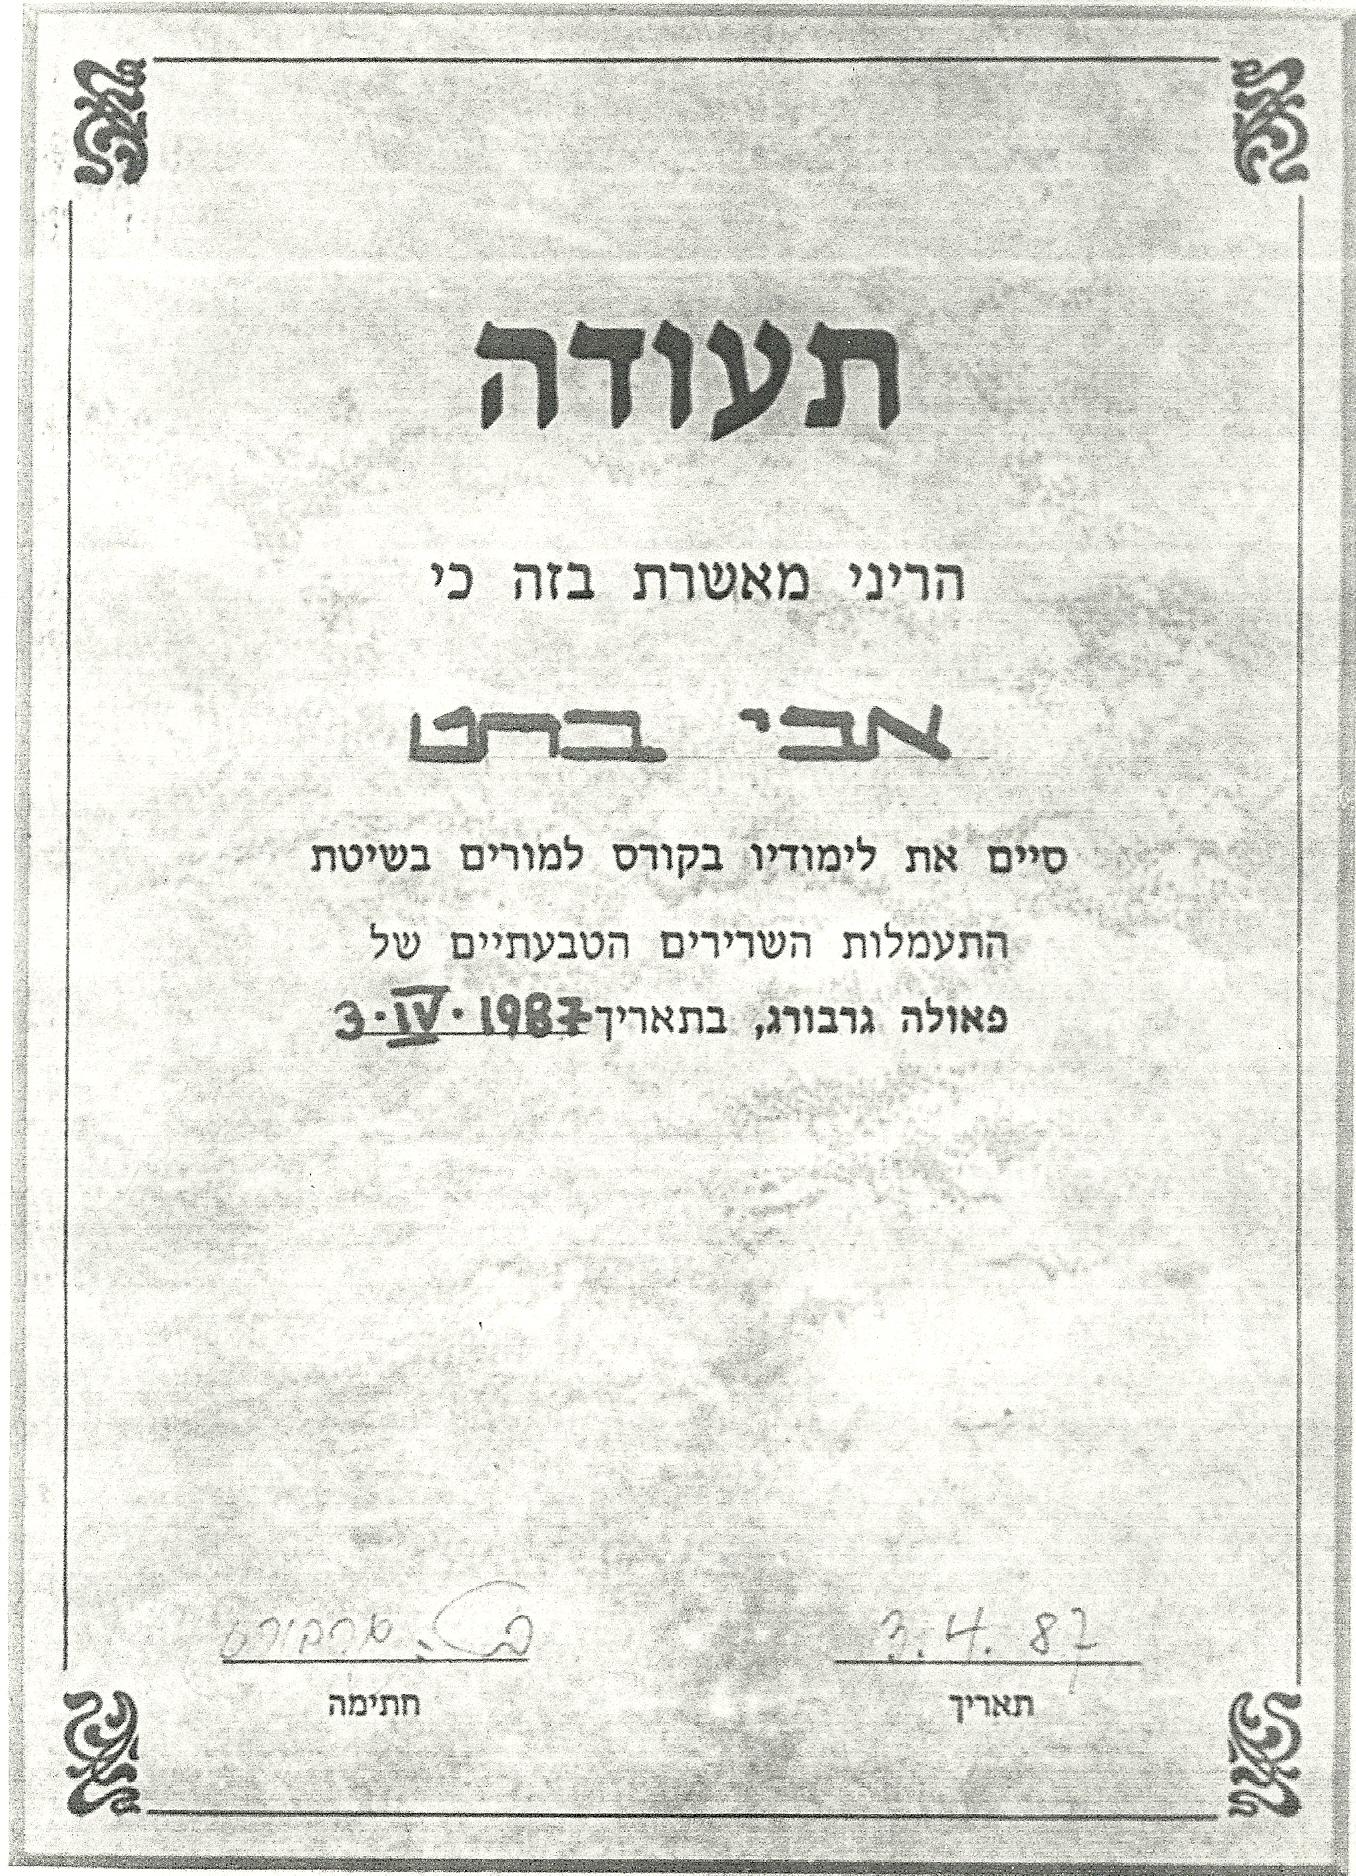 Paula Method Diploma 1987